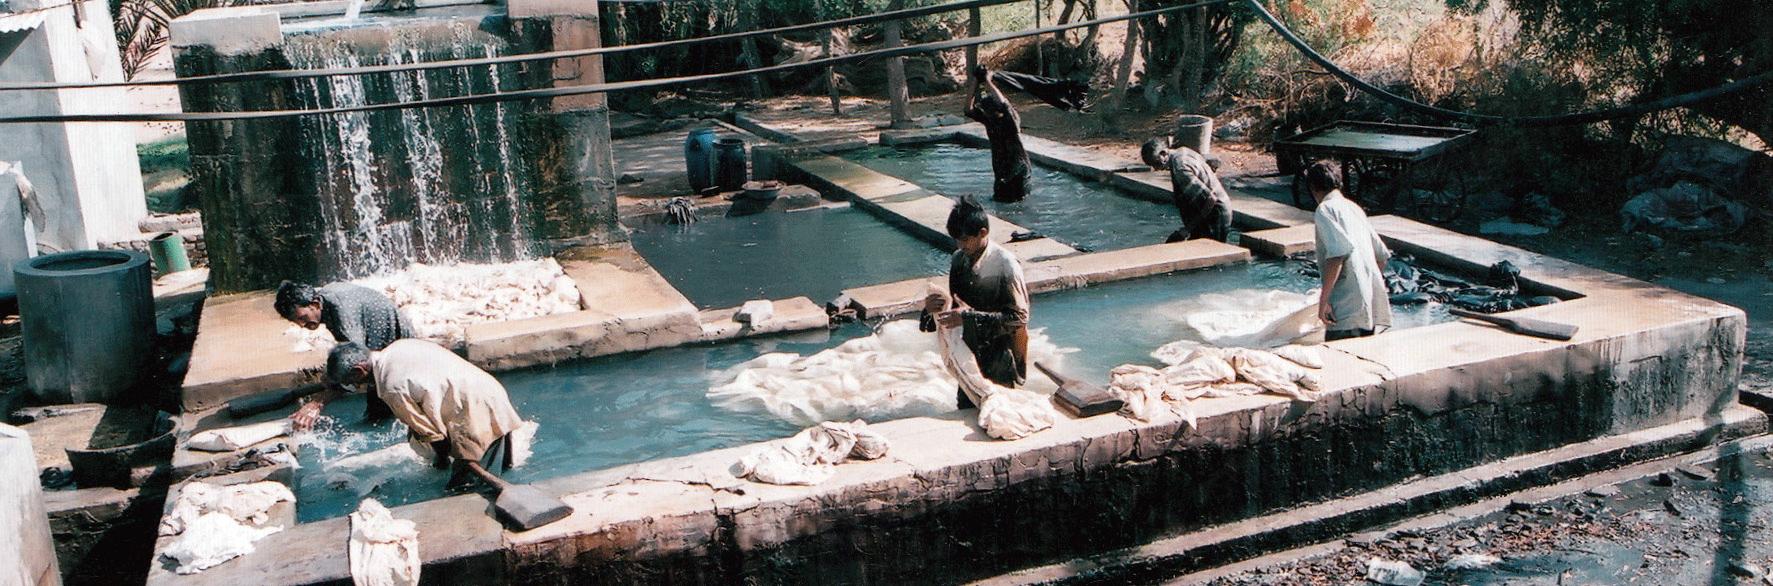 Washing at a farm in Dhamadka